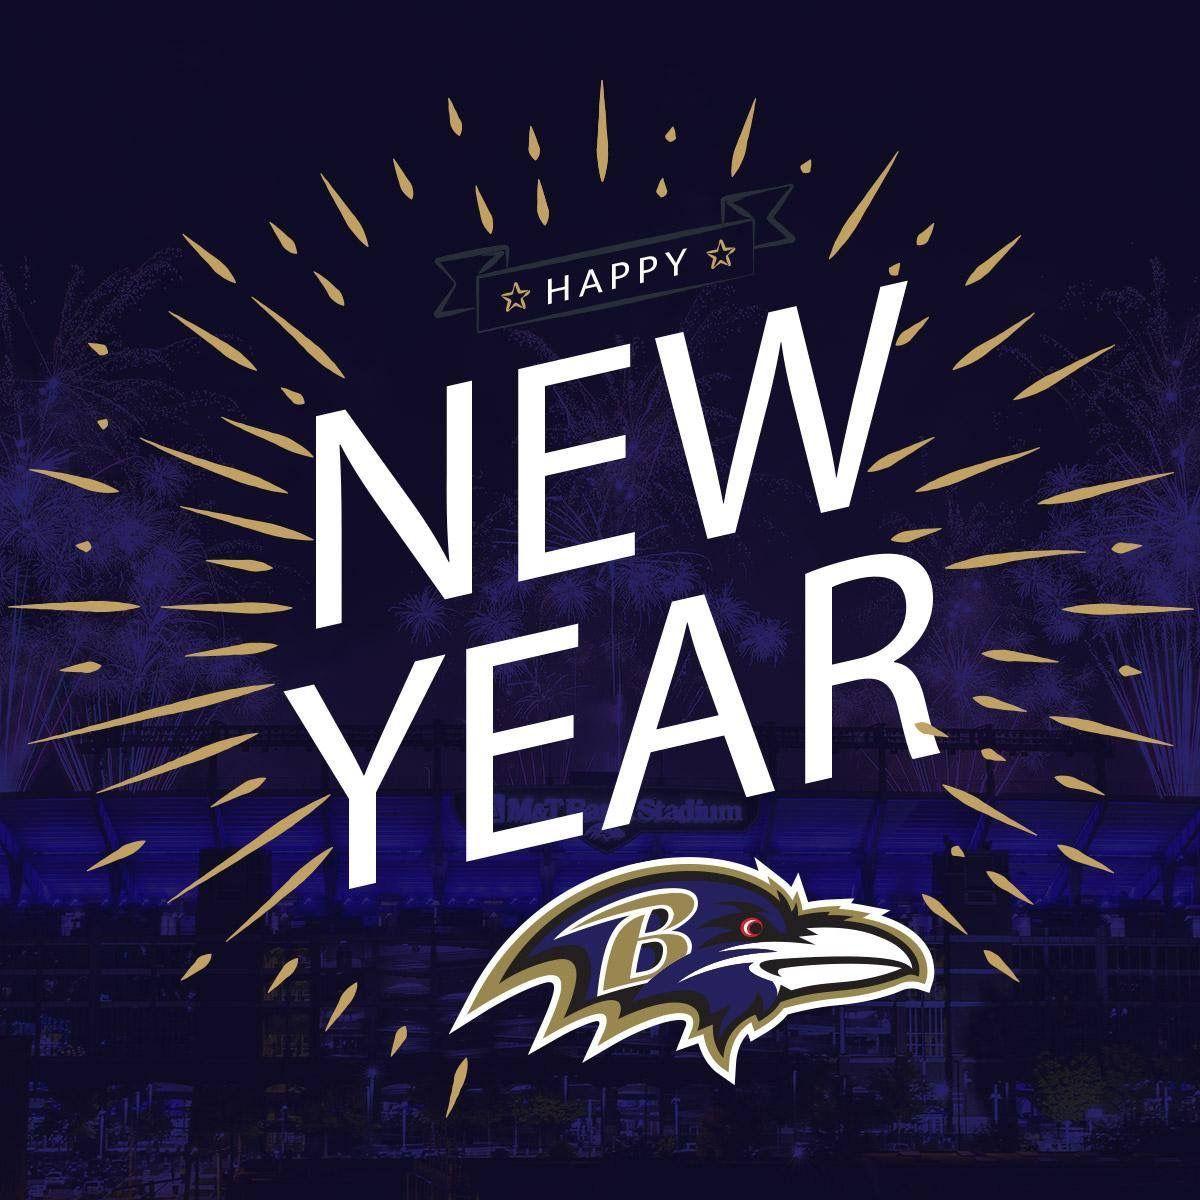 Ravens Baltimore ravens, Happy new year, Happy